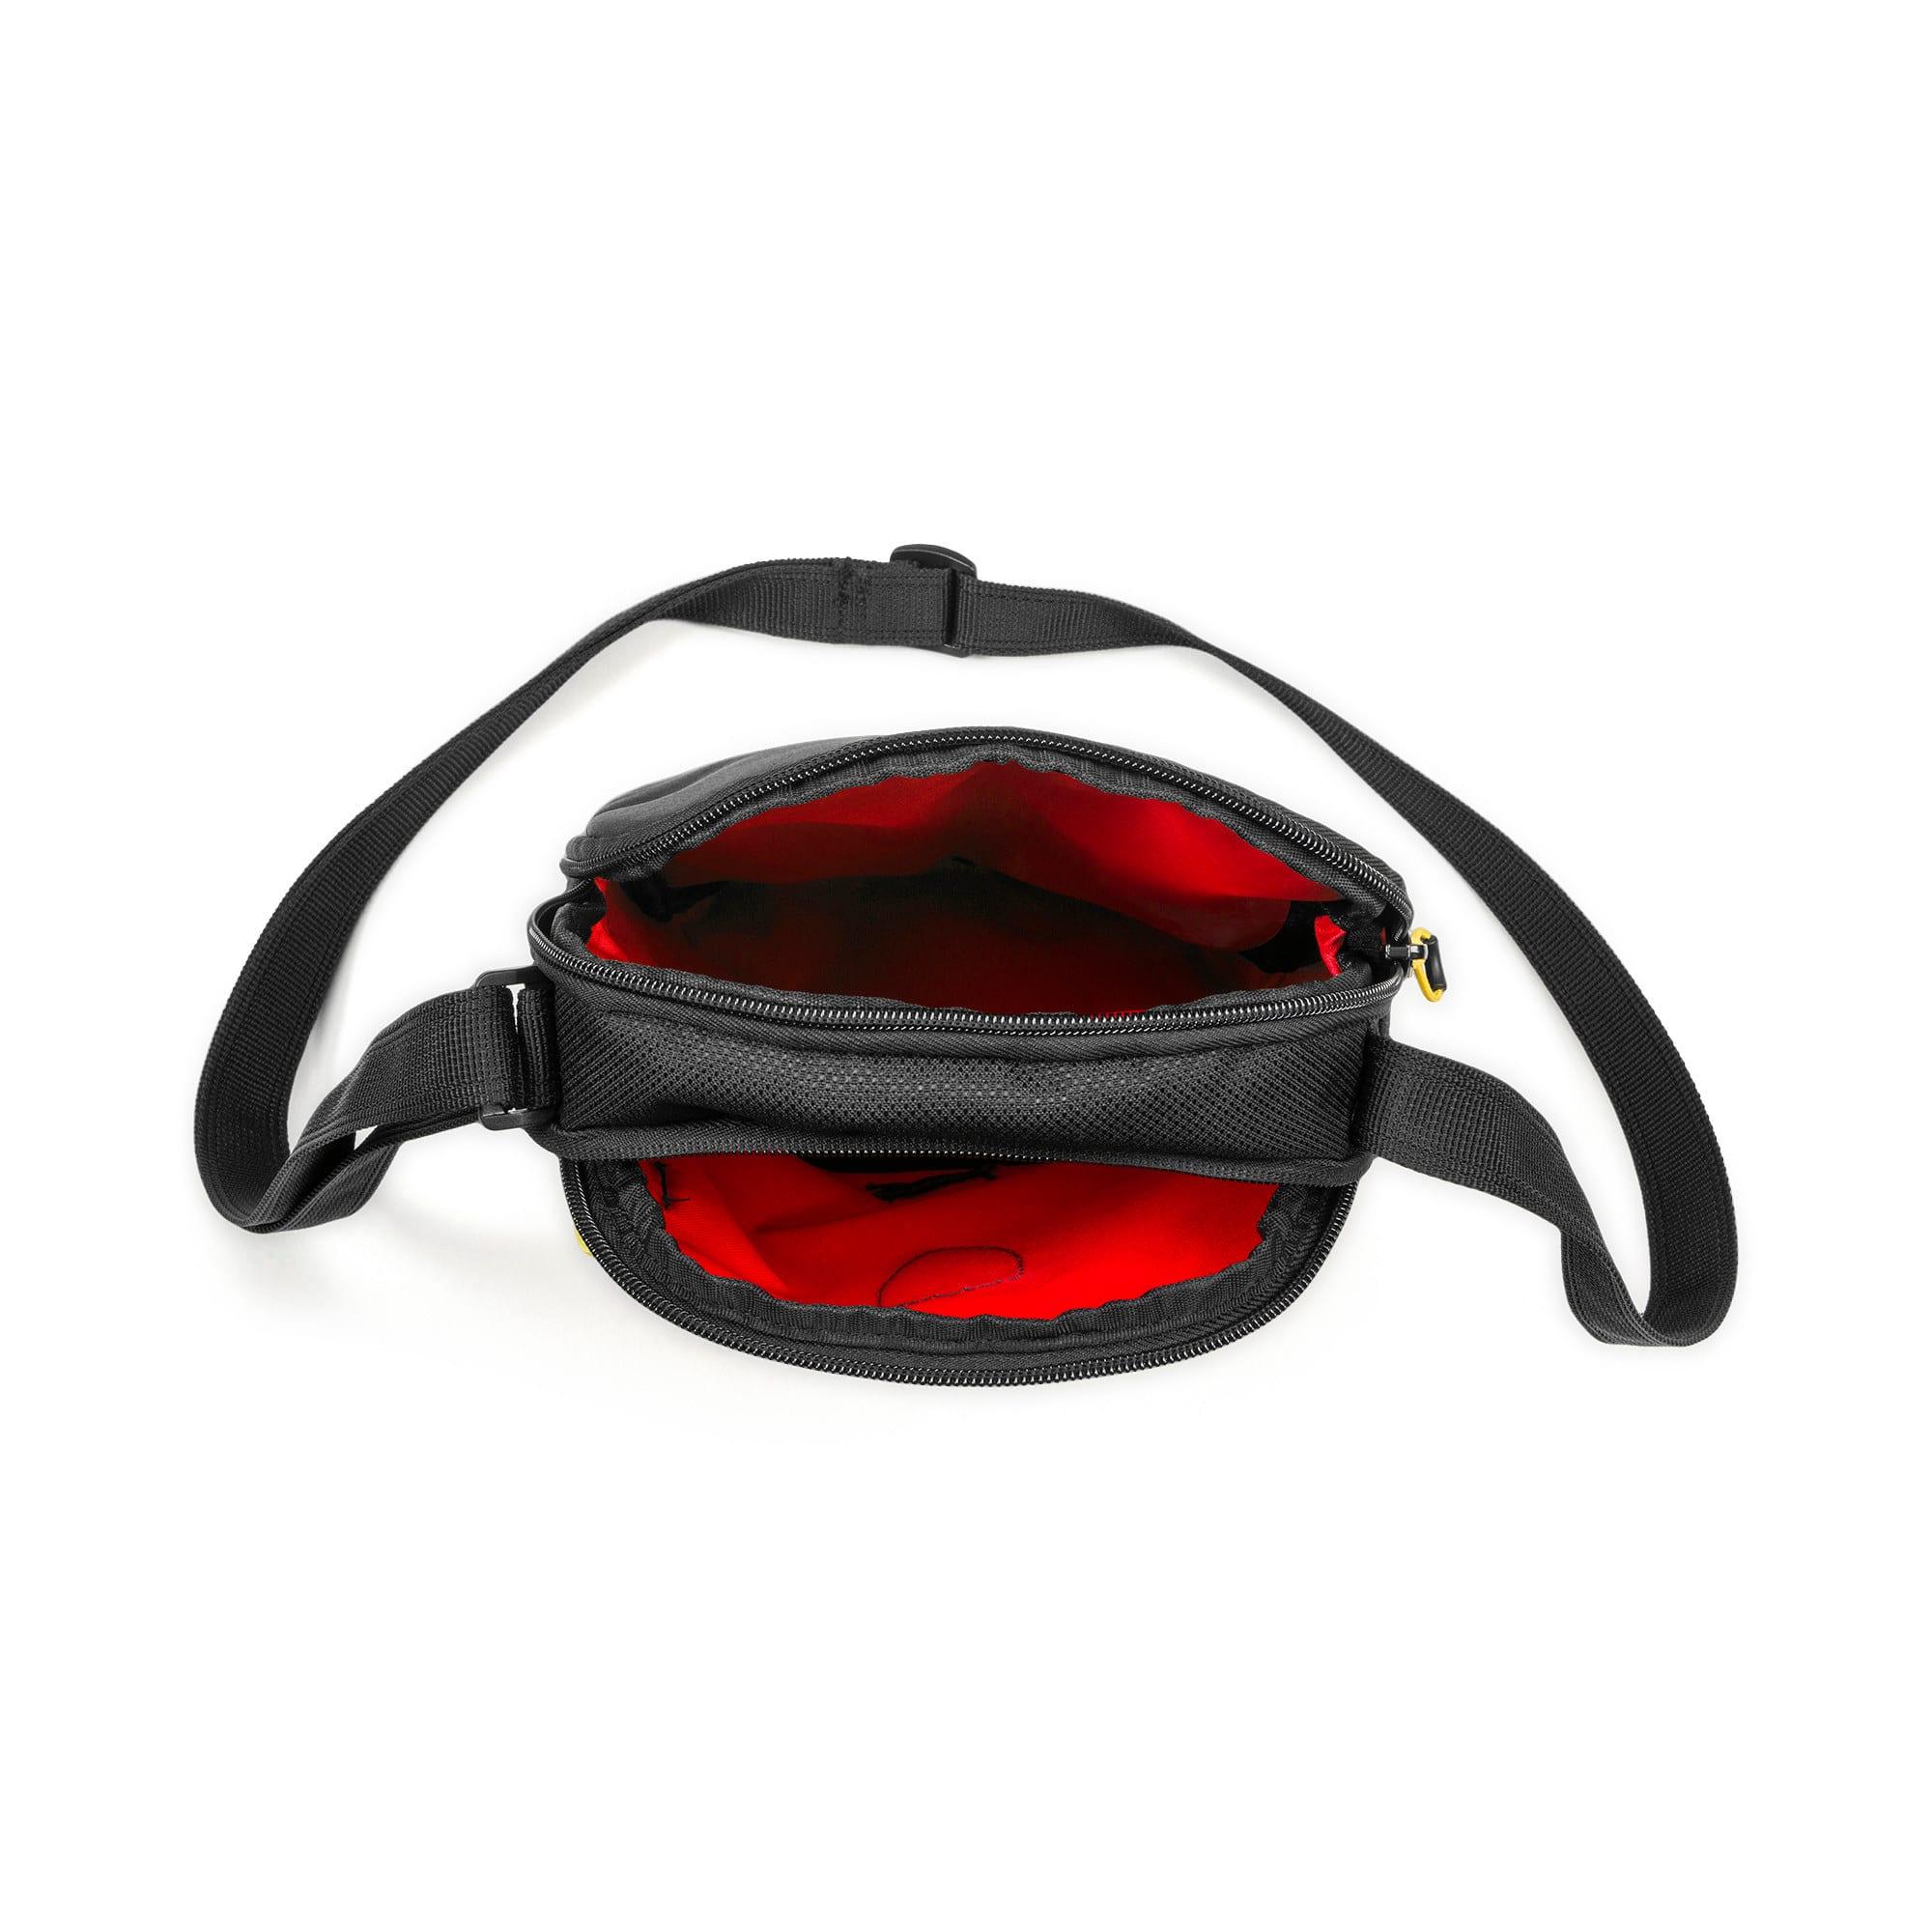 Thumbnail 3 of Scuderia Ferrari Fanwear Portable Bag, Rosso Corsa, medium